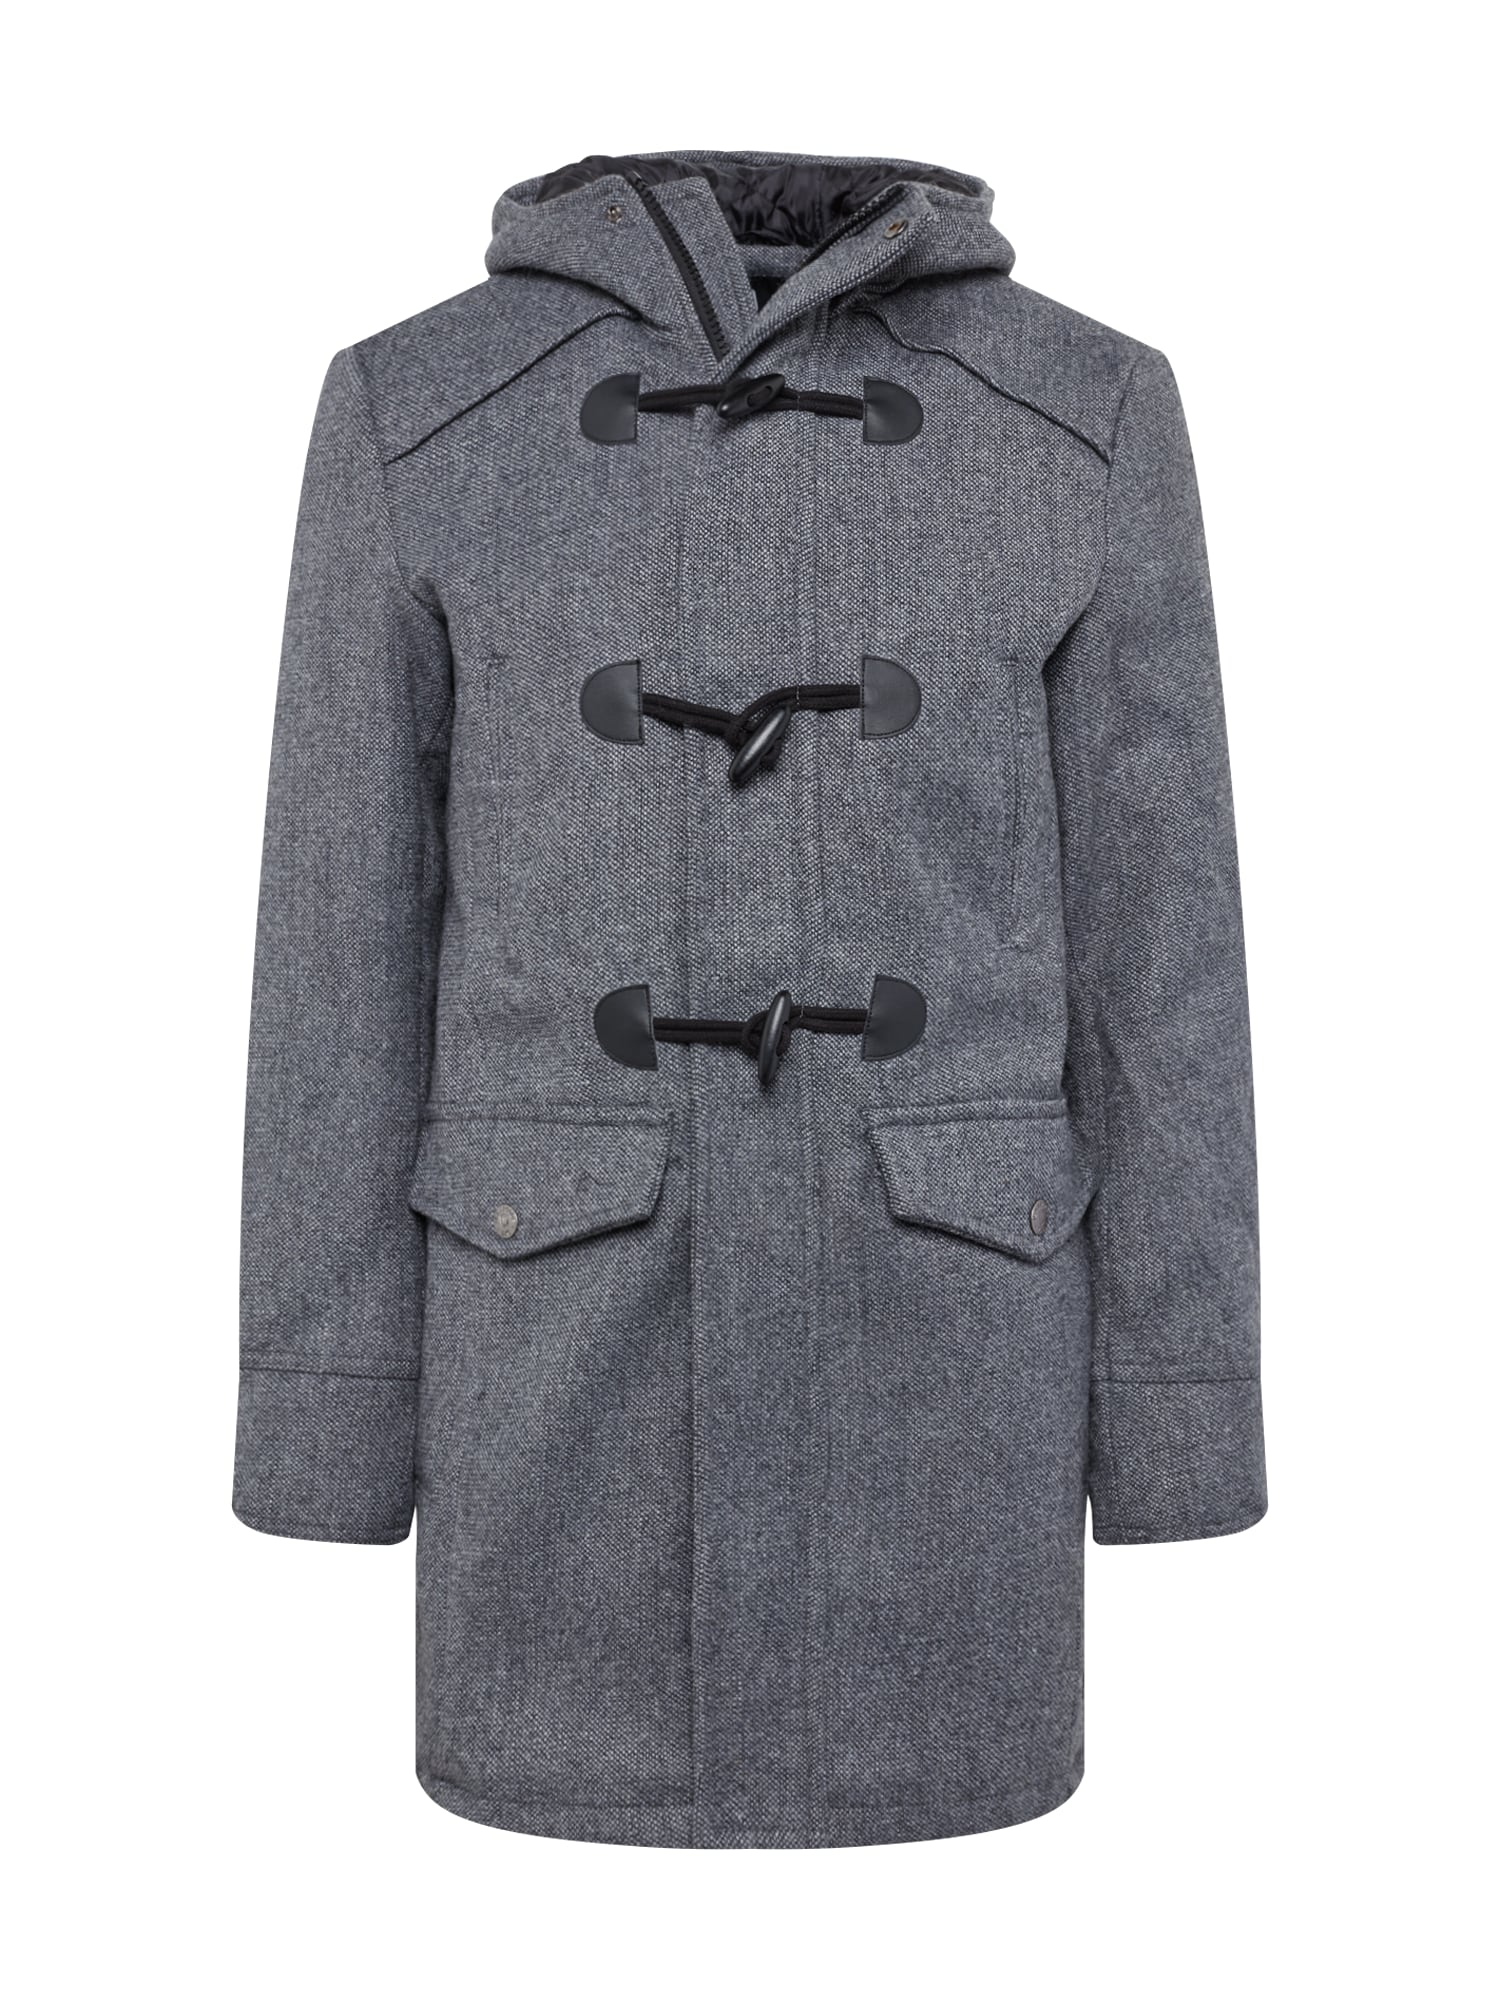 INDICODE JEANS Žieminis paltas 'Liam Solid' pilka